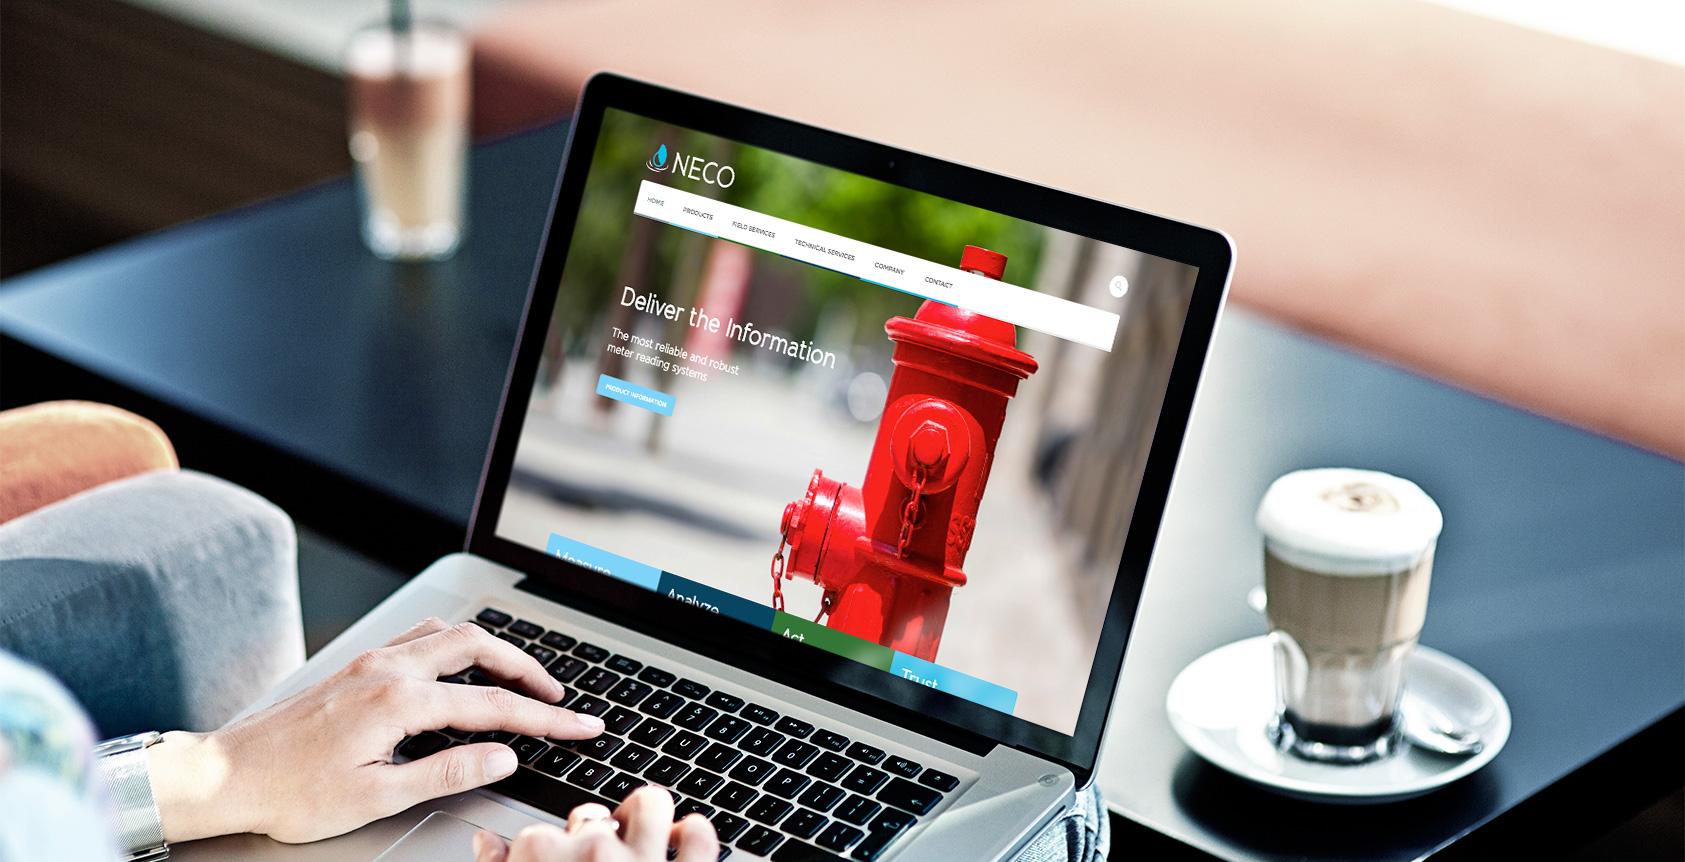 NECO-site-mockup2